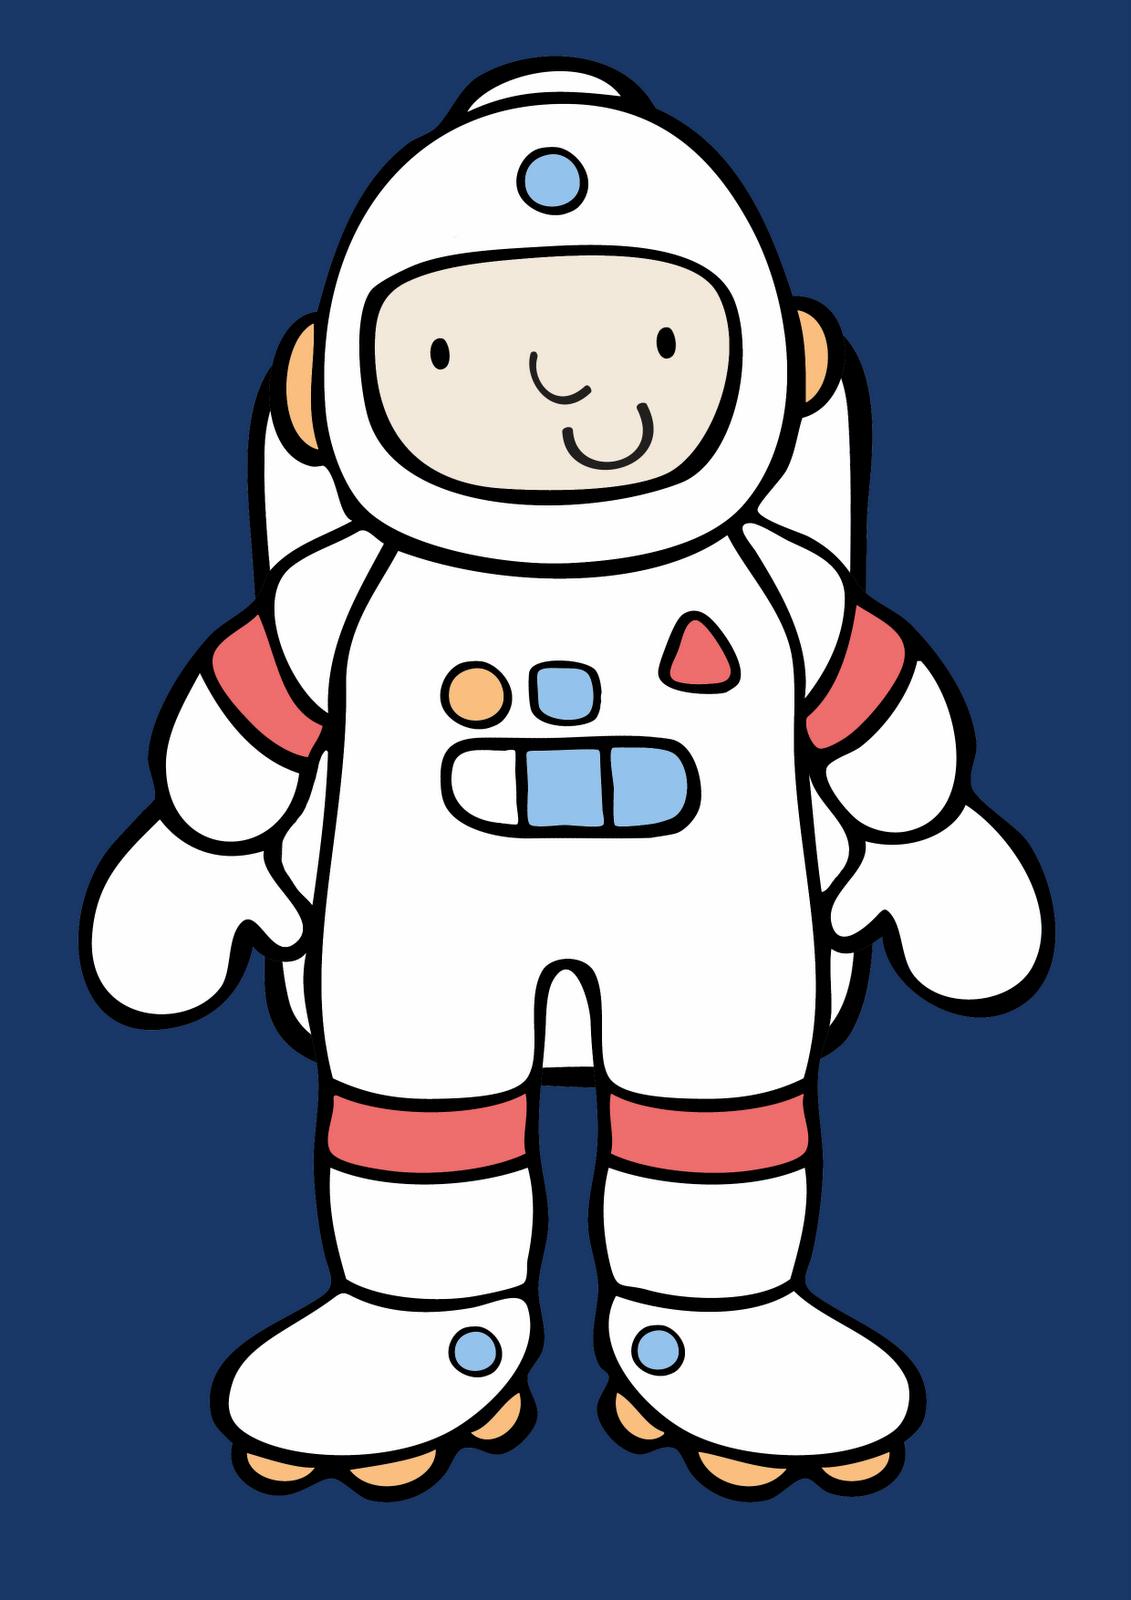 astronaut stencil template - photo #40